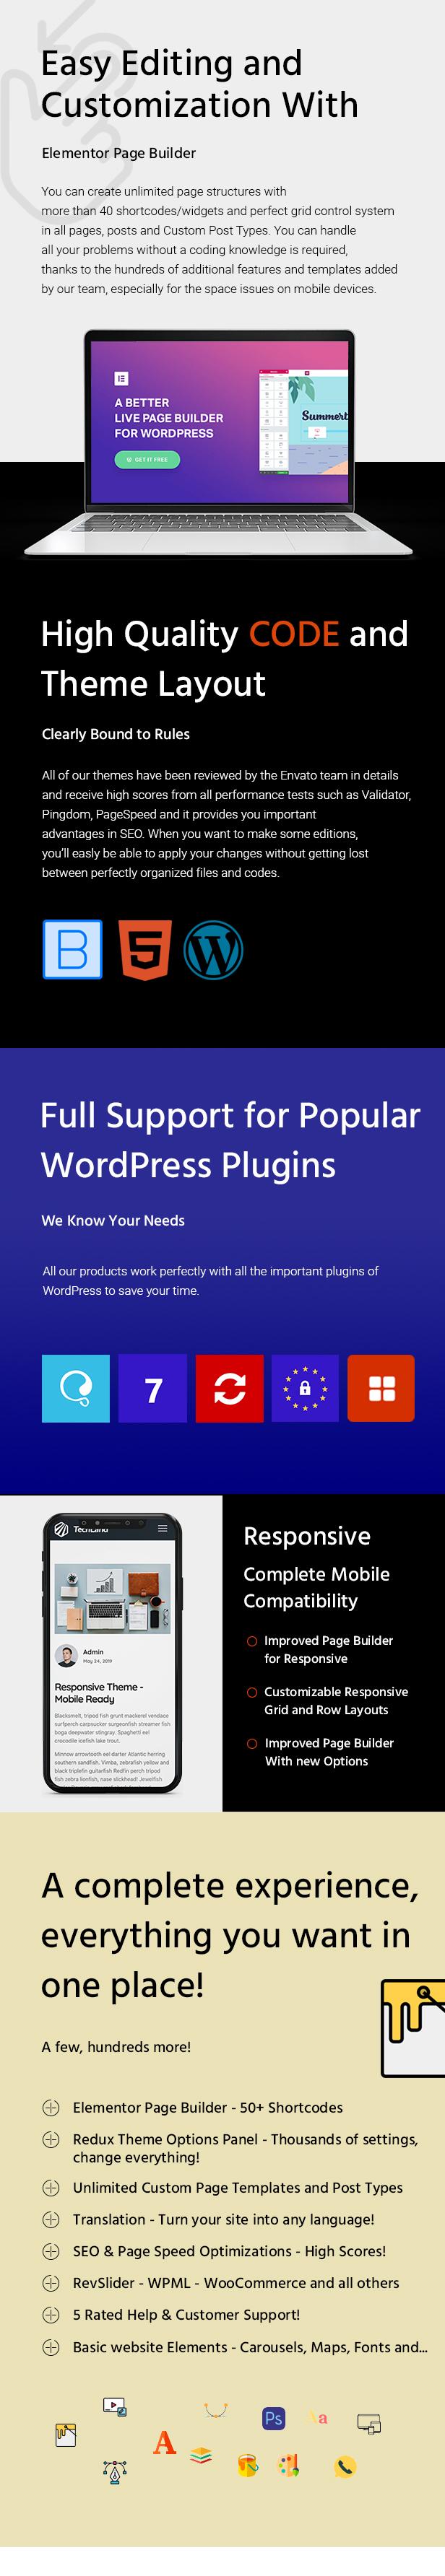 betakit - Elementor WordPress Theme for Digital & Marketing Agencies